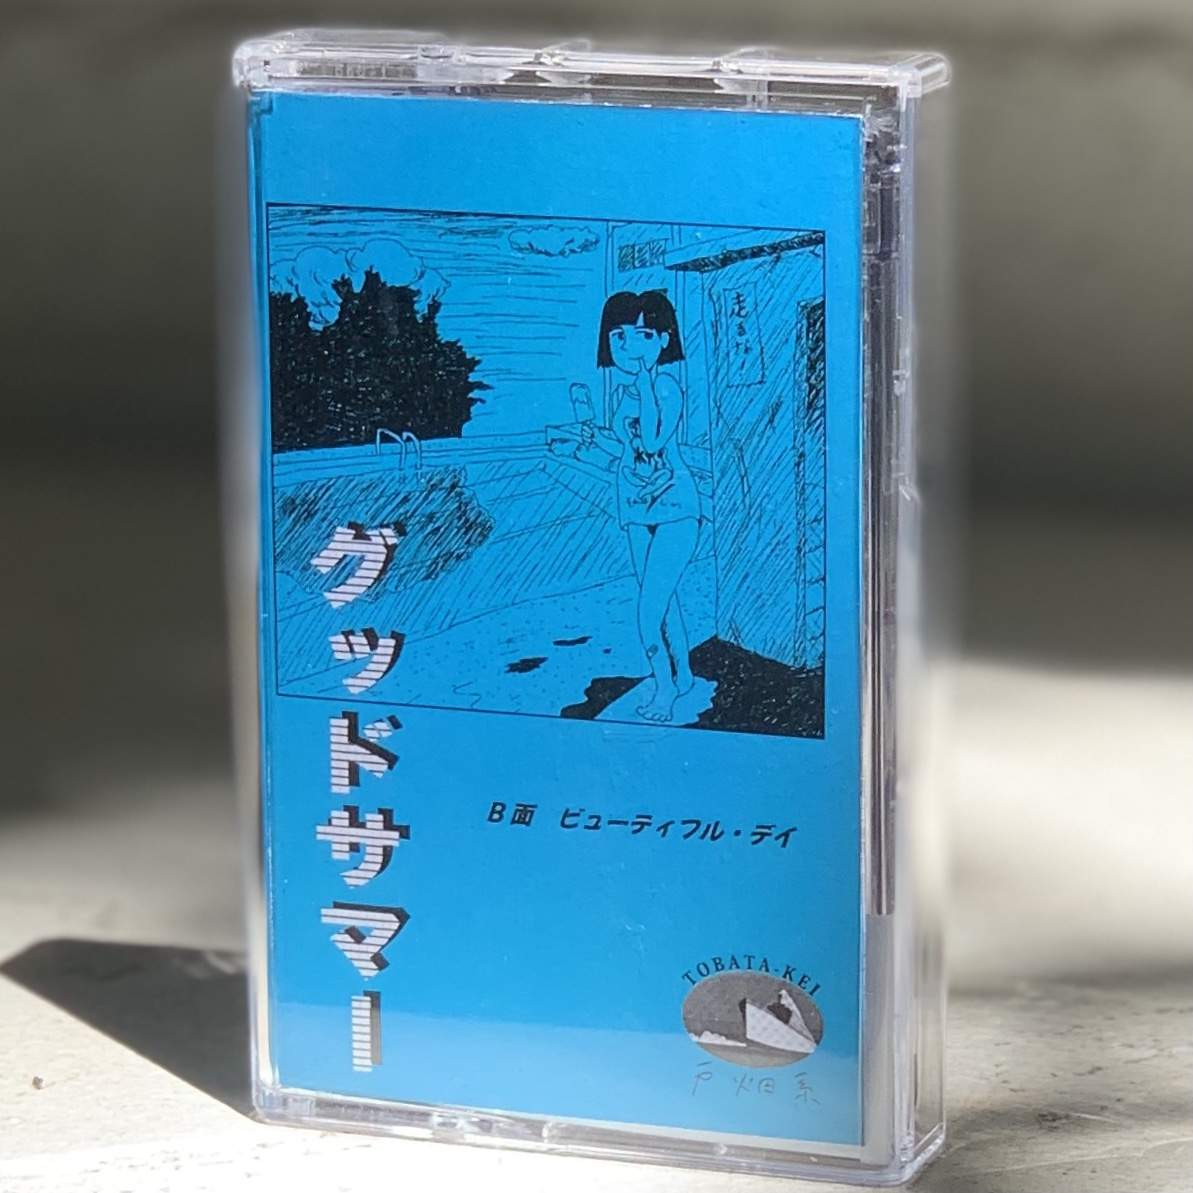 http://rose-records.jp/files/20210821000552.jpg